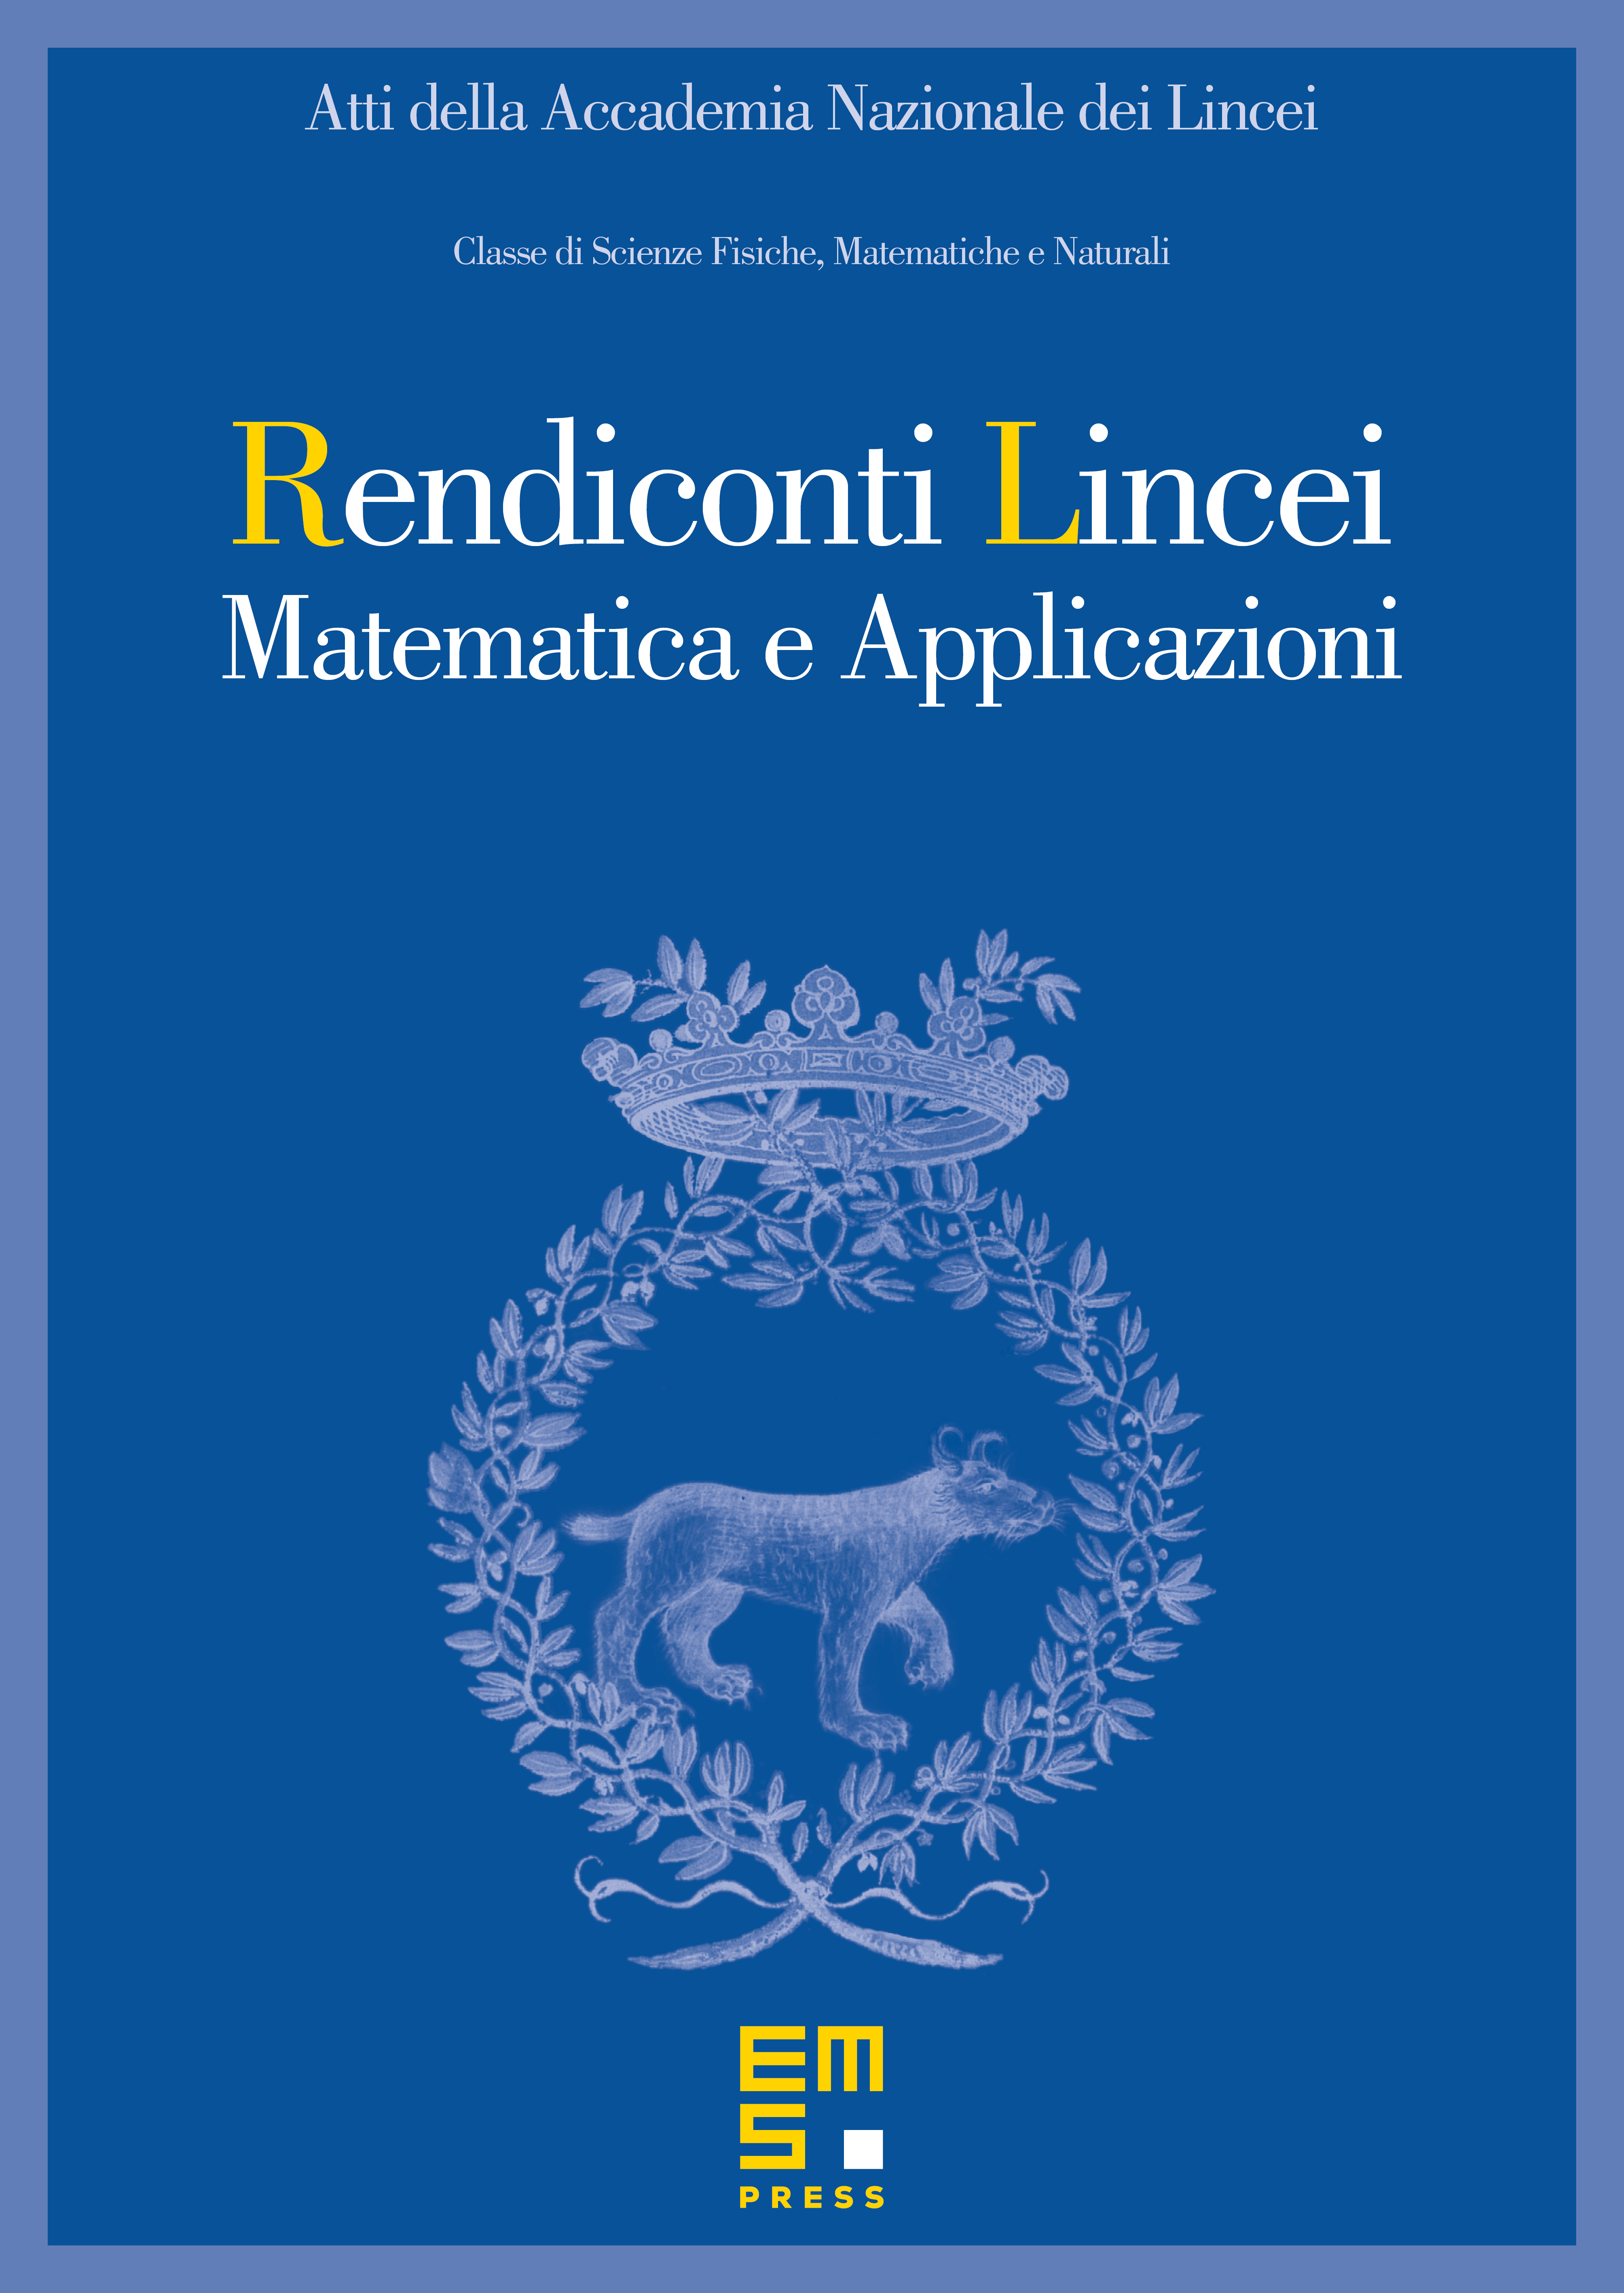 Atti Accad. Naz. Lincei Cl. Sci. Fis. Mat. Natur. cover